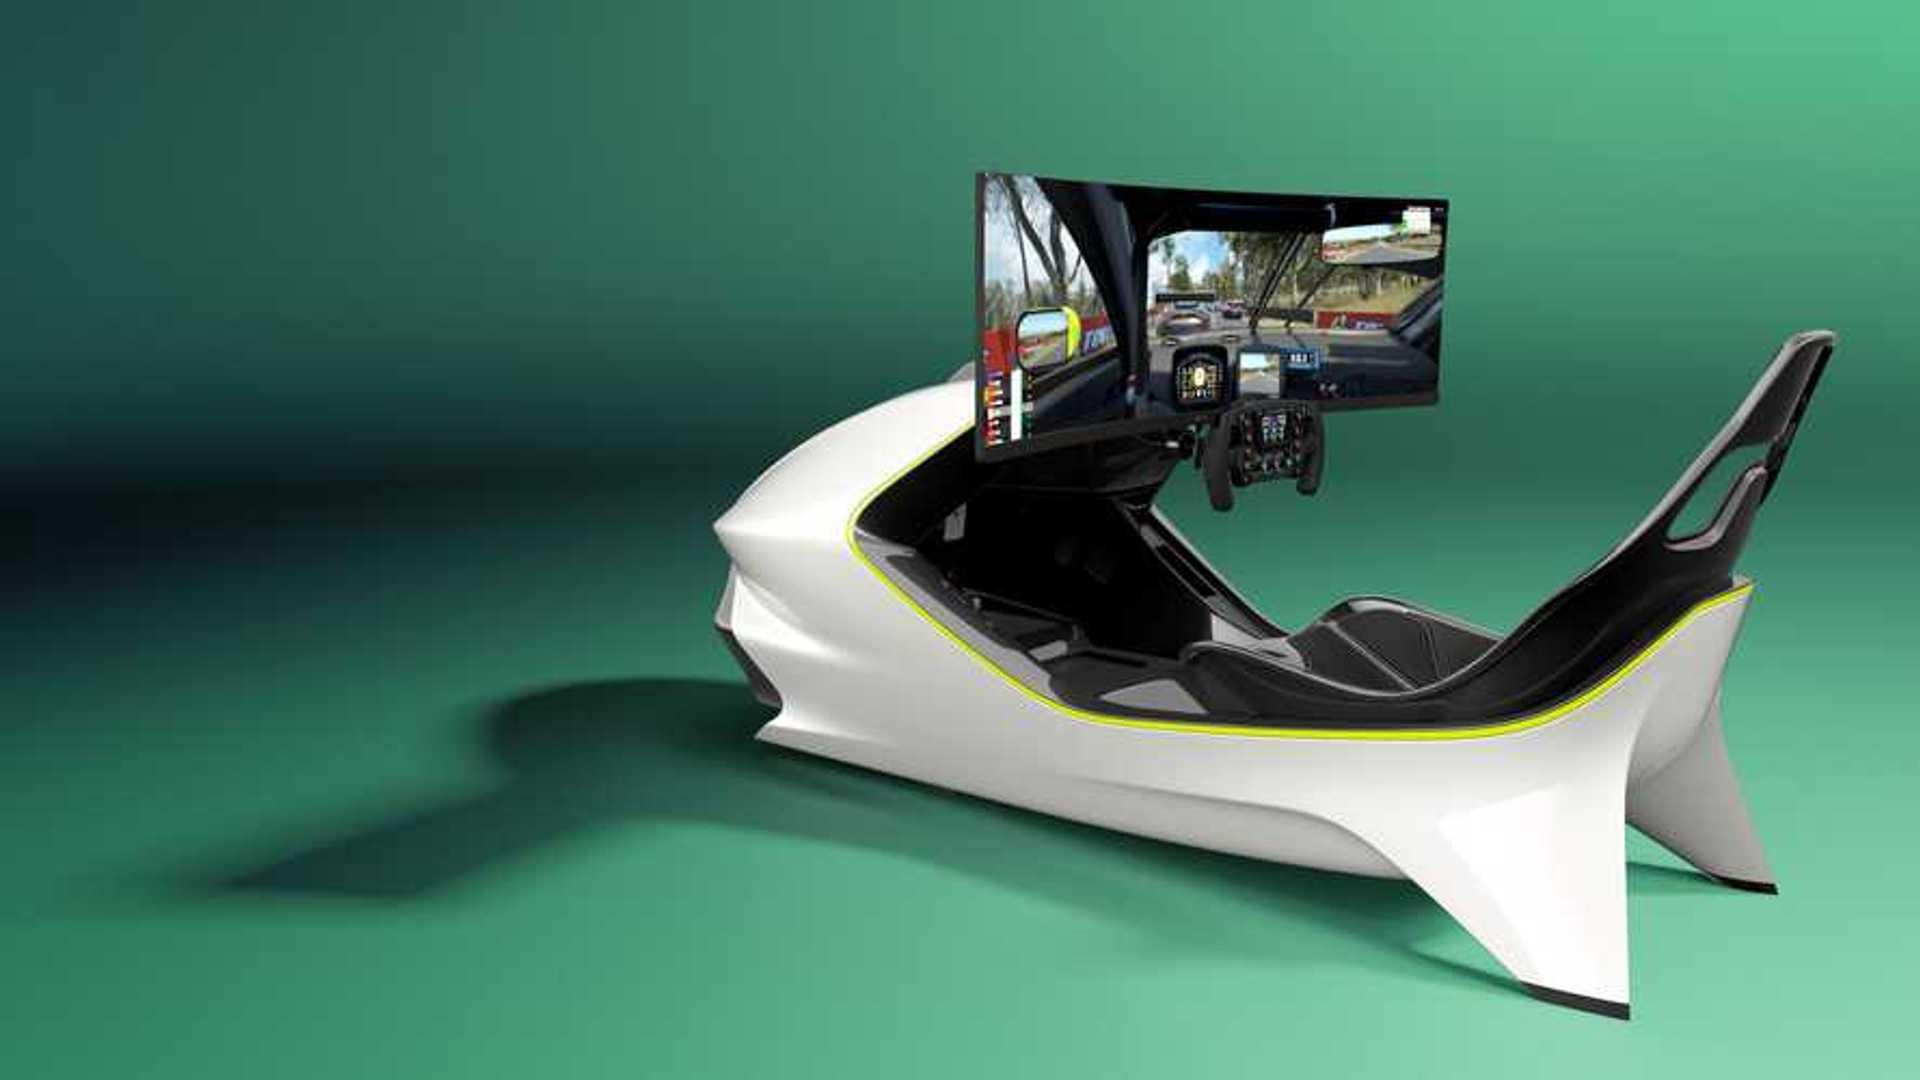 The Aston Martin Of Racing Simulators Costs Porsche Boxster S Money